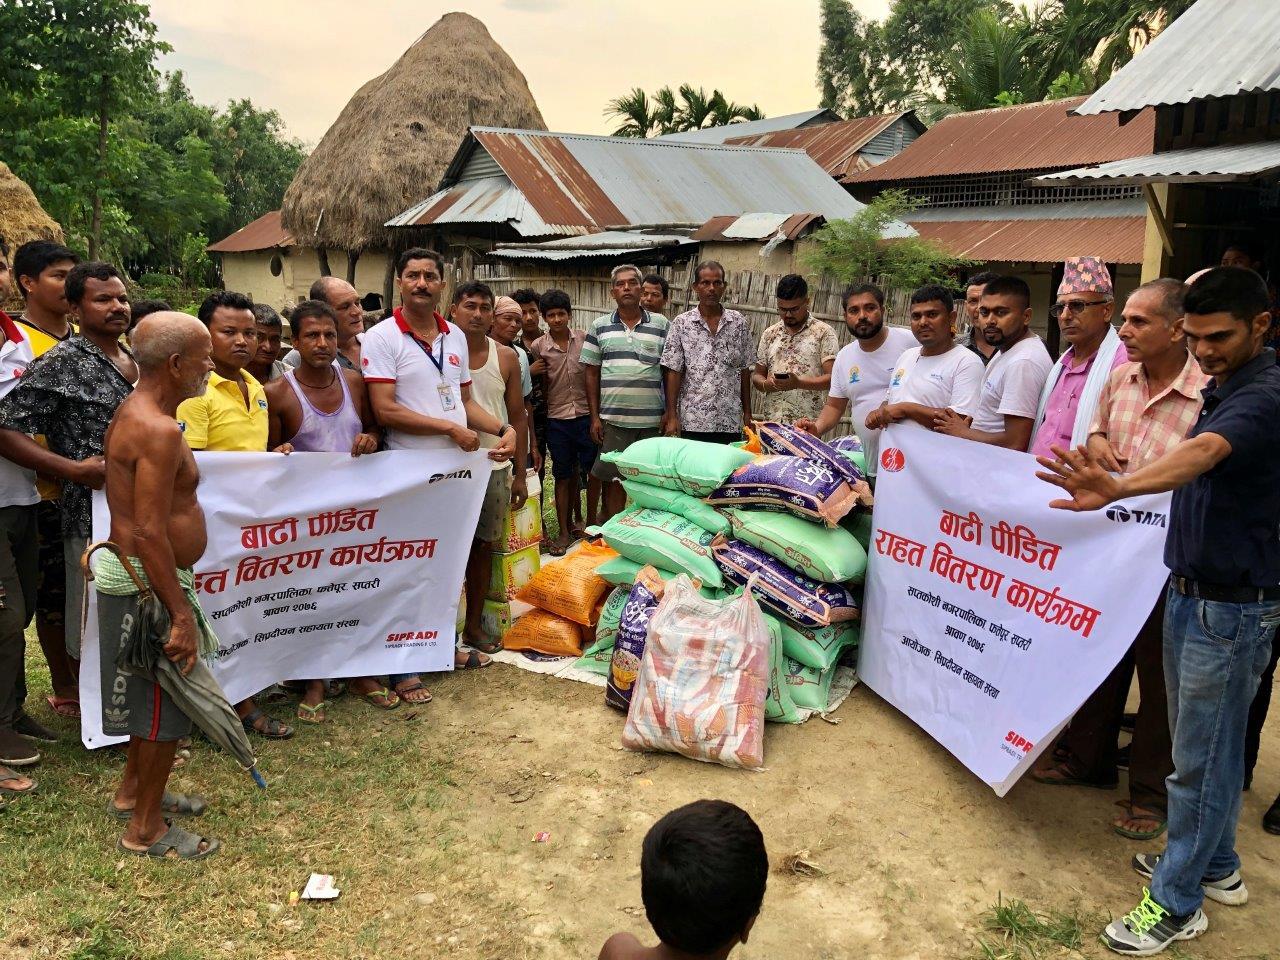 सिप्रदीयन सहायता संस्थाद्वारा बाढीपीडितलाई राहत वितरण